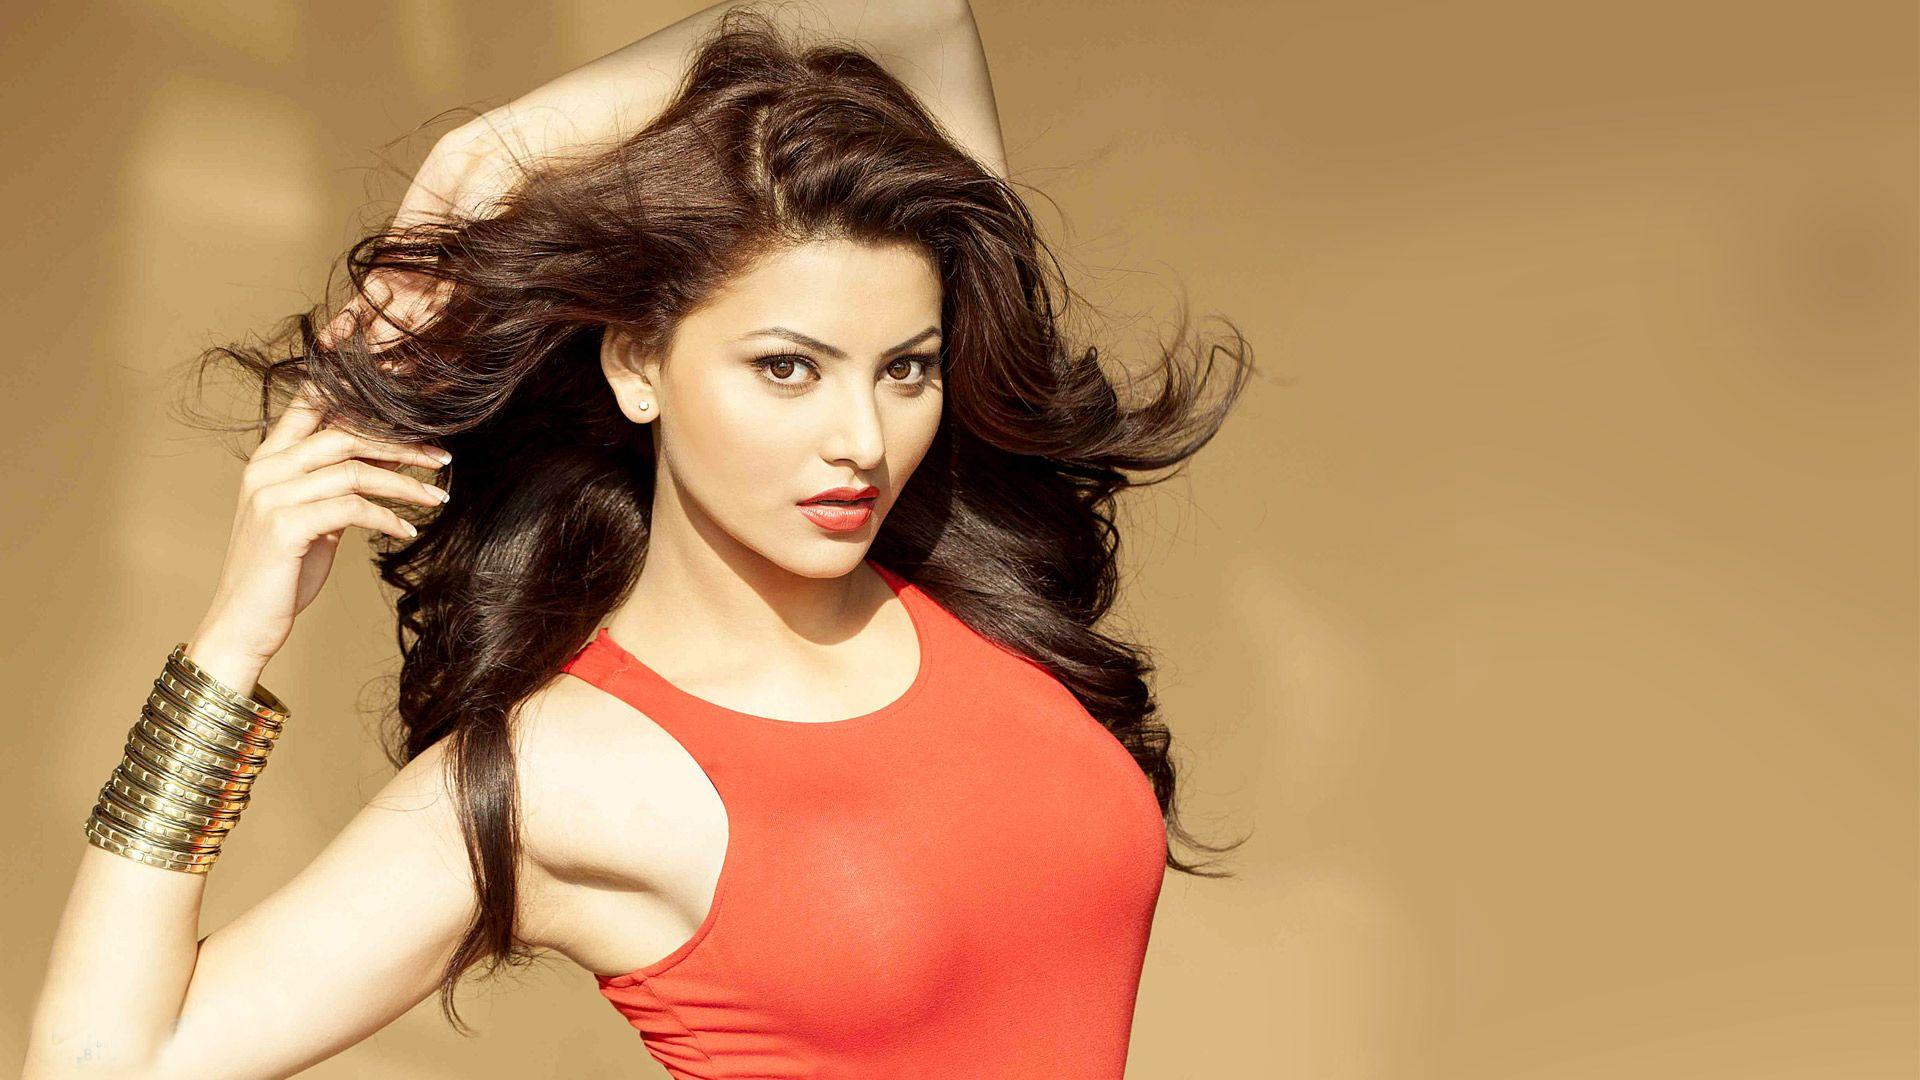 Urvashi Rautela New Wallpaper Bollywood Actress Actresses Urvashi Rautela Bikini